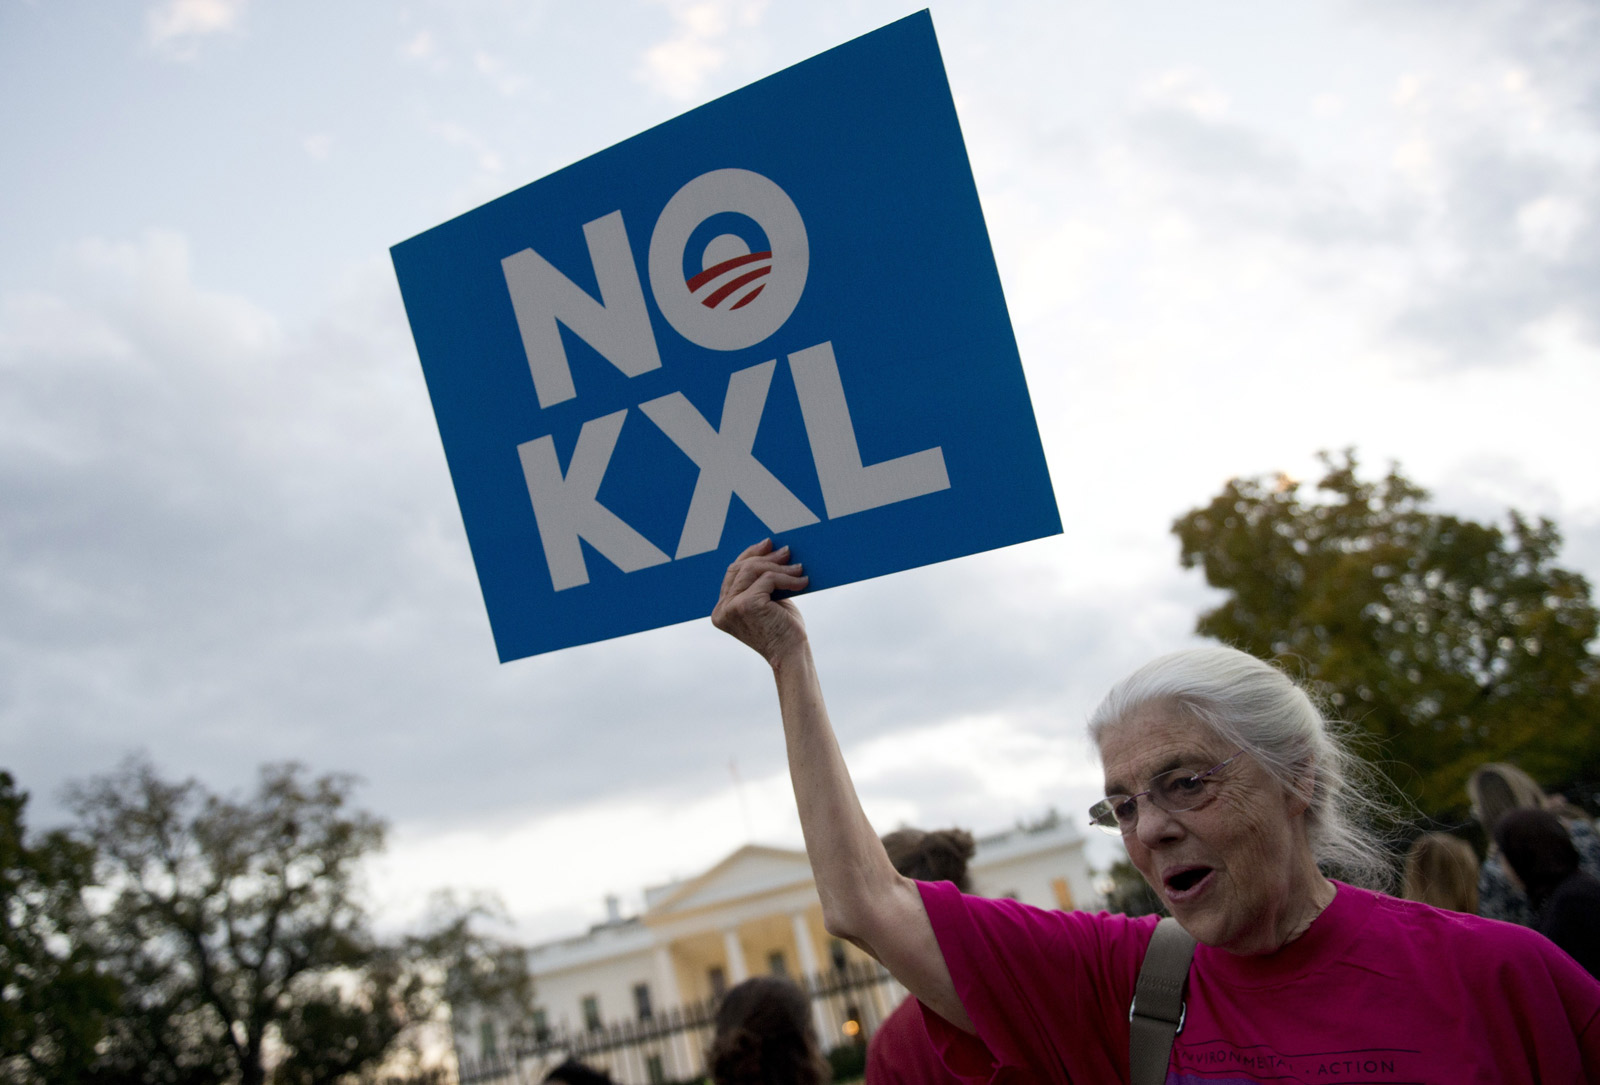 A protester celebrating President Barack Obama's decision to block the Keystone XL oil pipeline, Washington, D.C., November 6, 2015